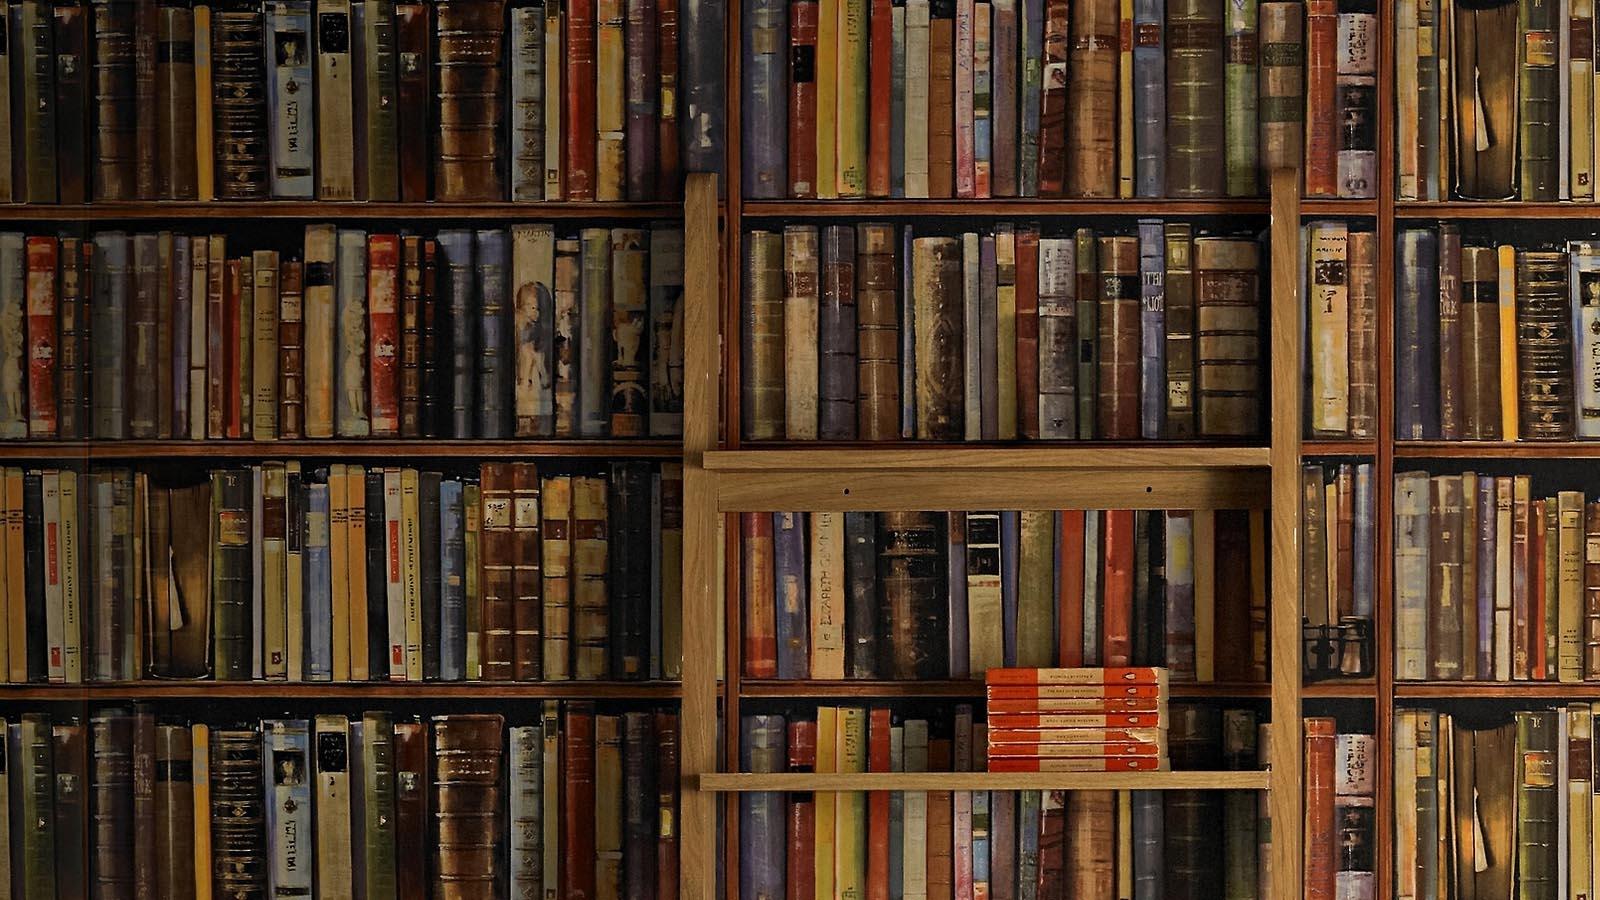 Biblioteczka – książki popularnonaukowe